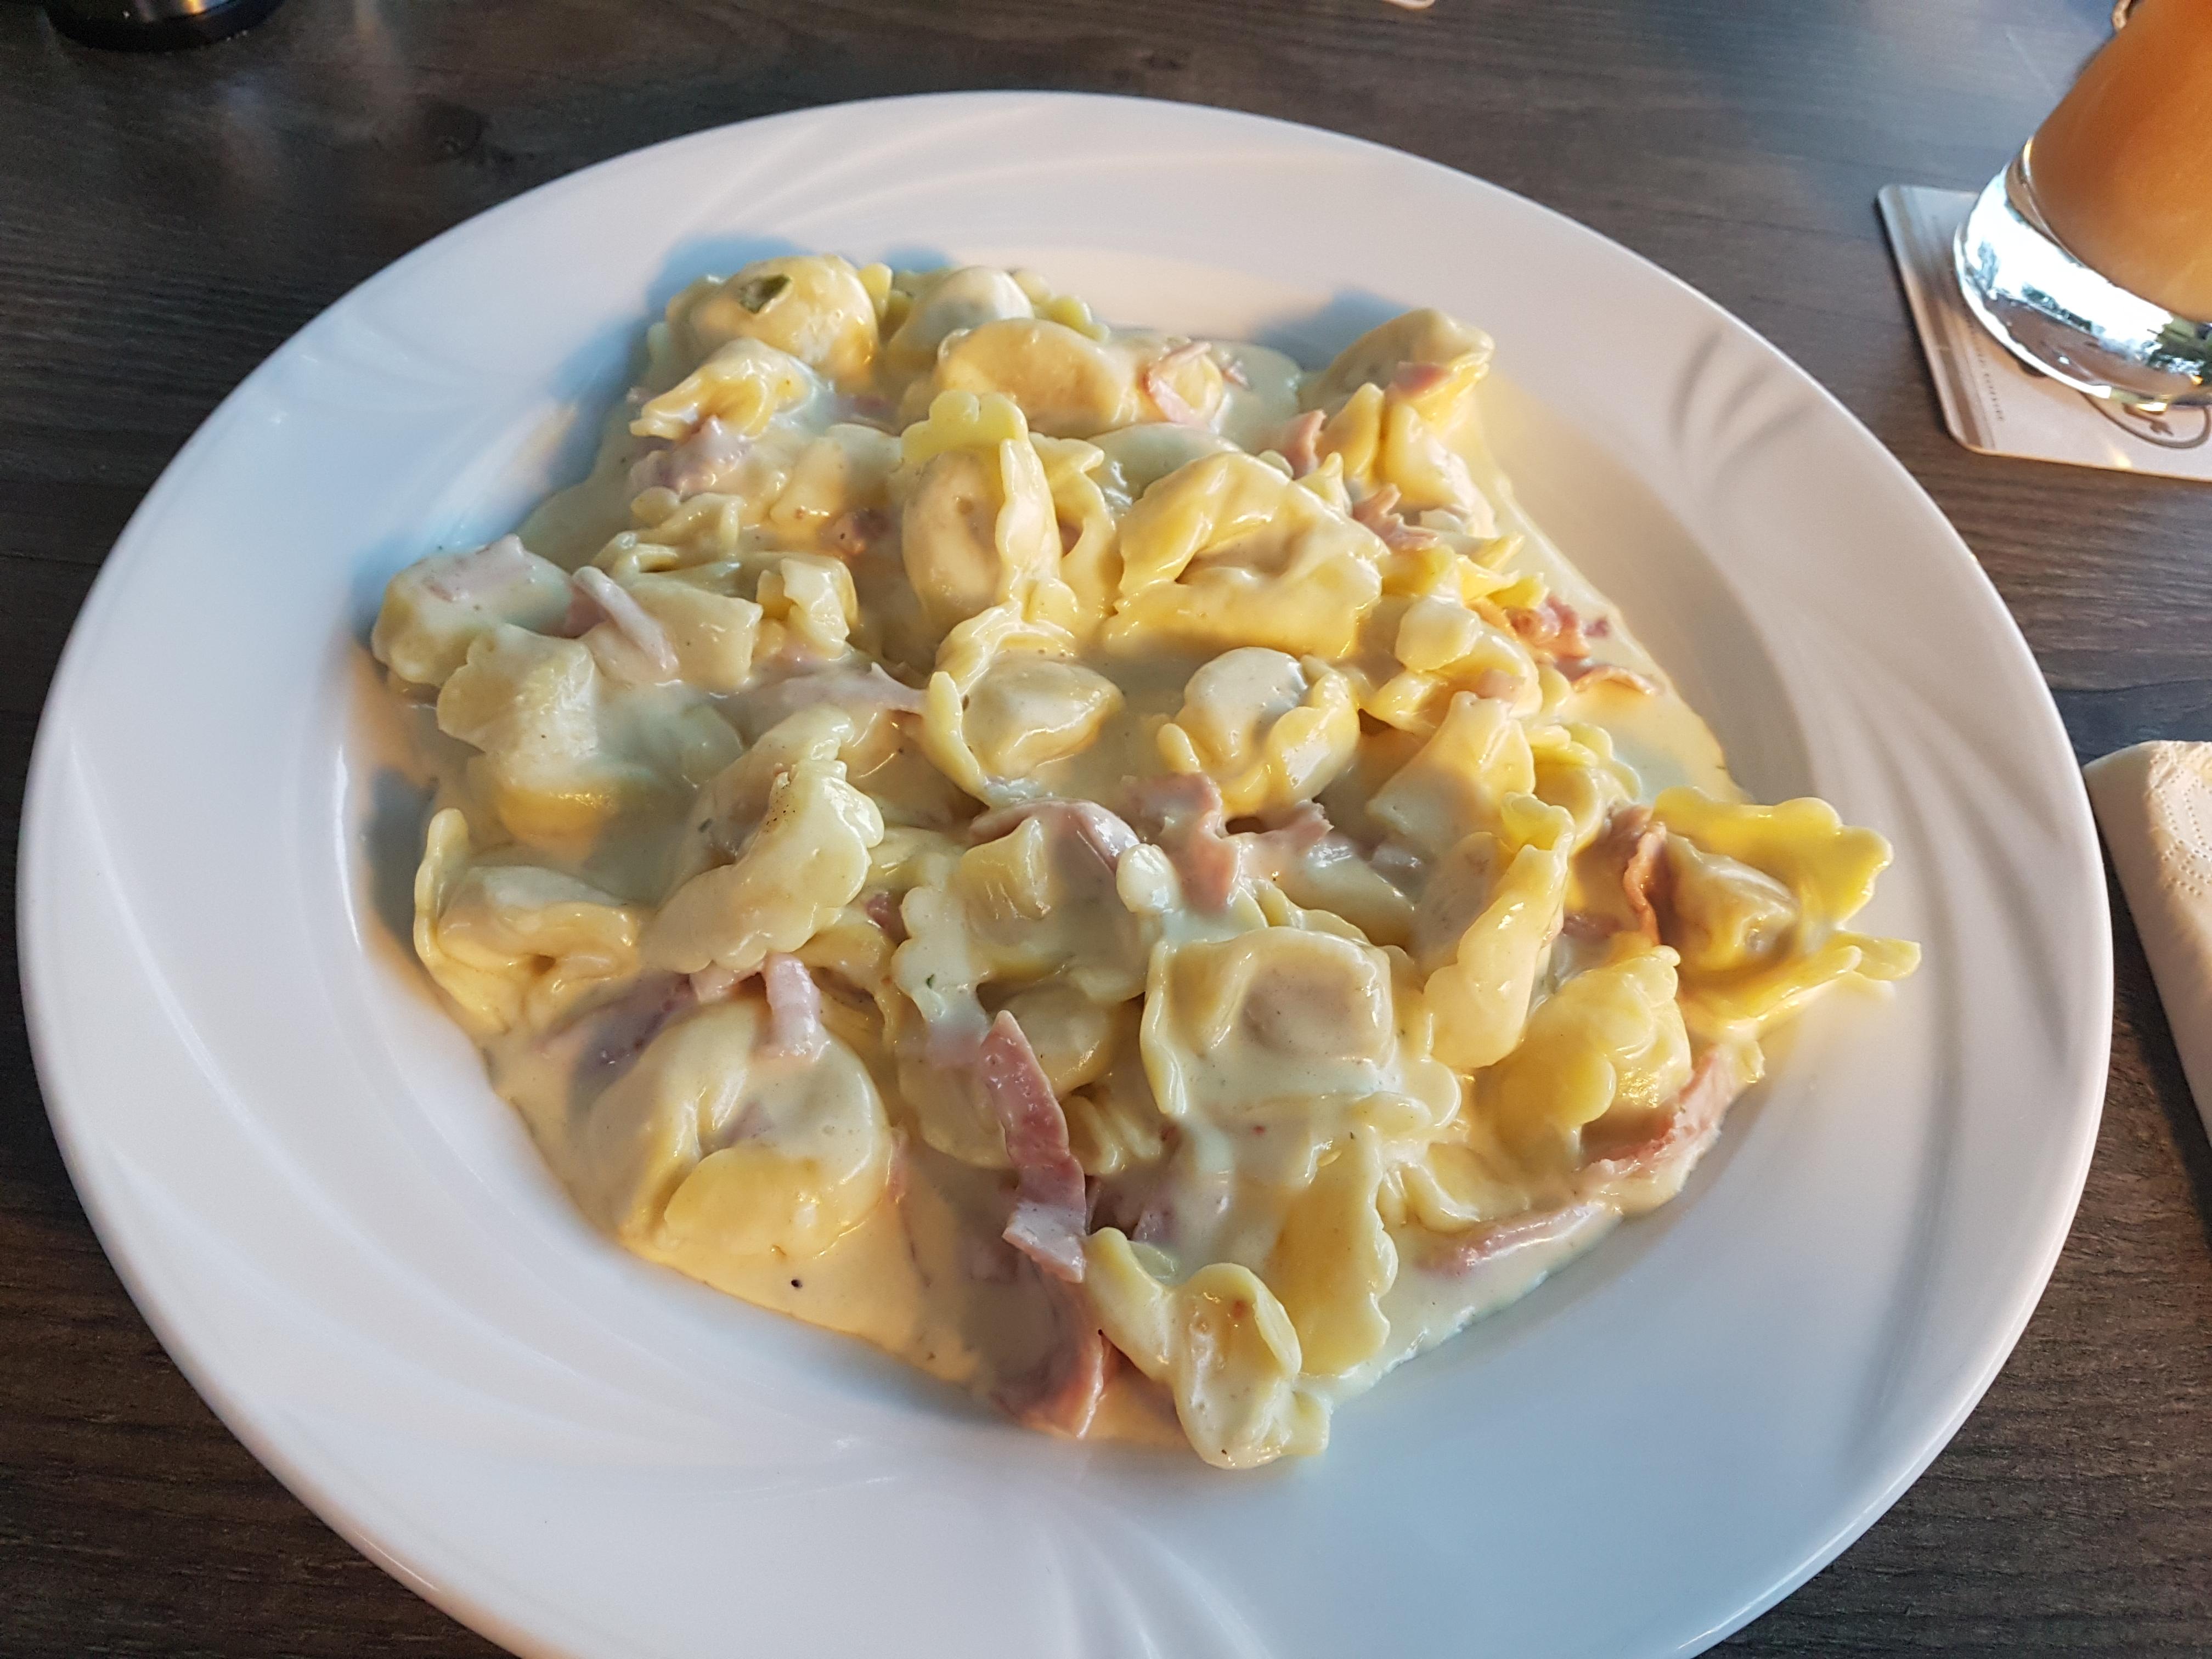 https://foodloader.net/Holz_2018-07-07_Tortellini_a_la_Panna.jpg